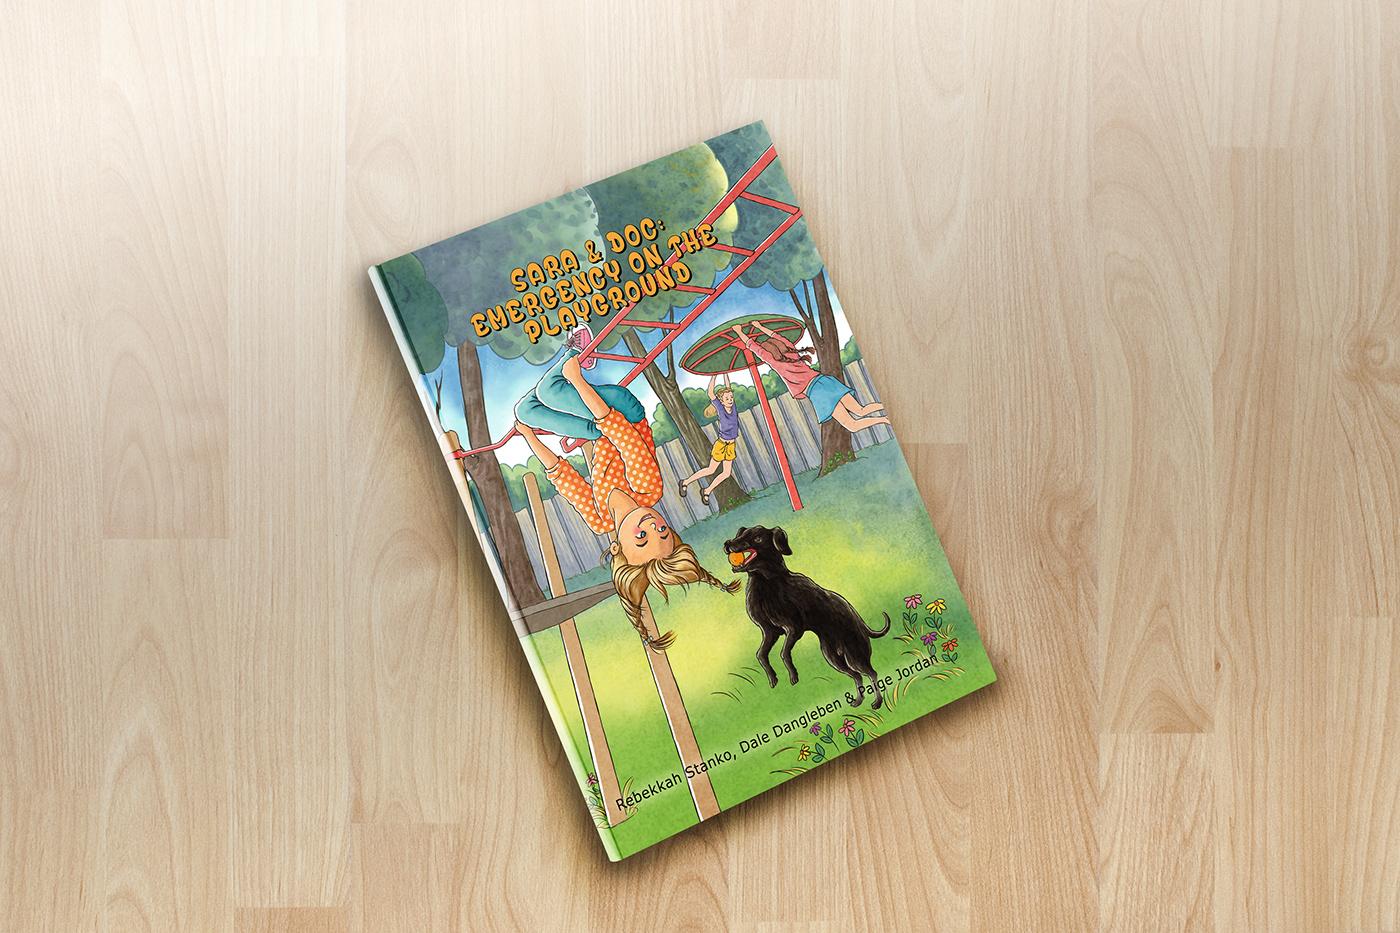 Image may contain: book, animal and box